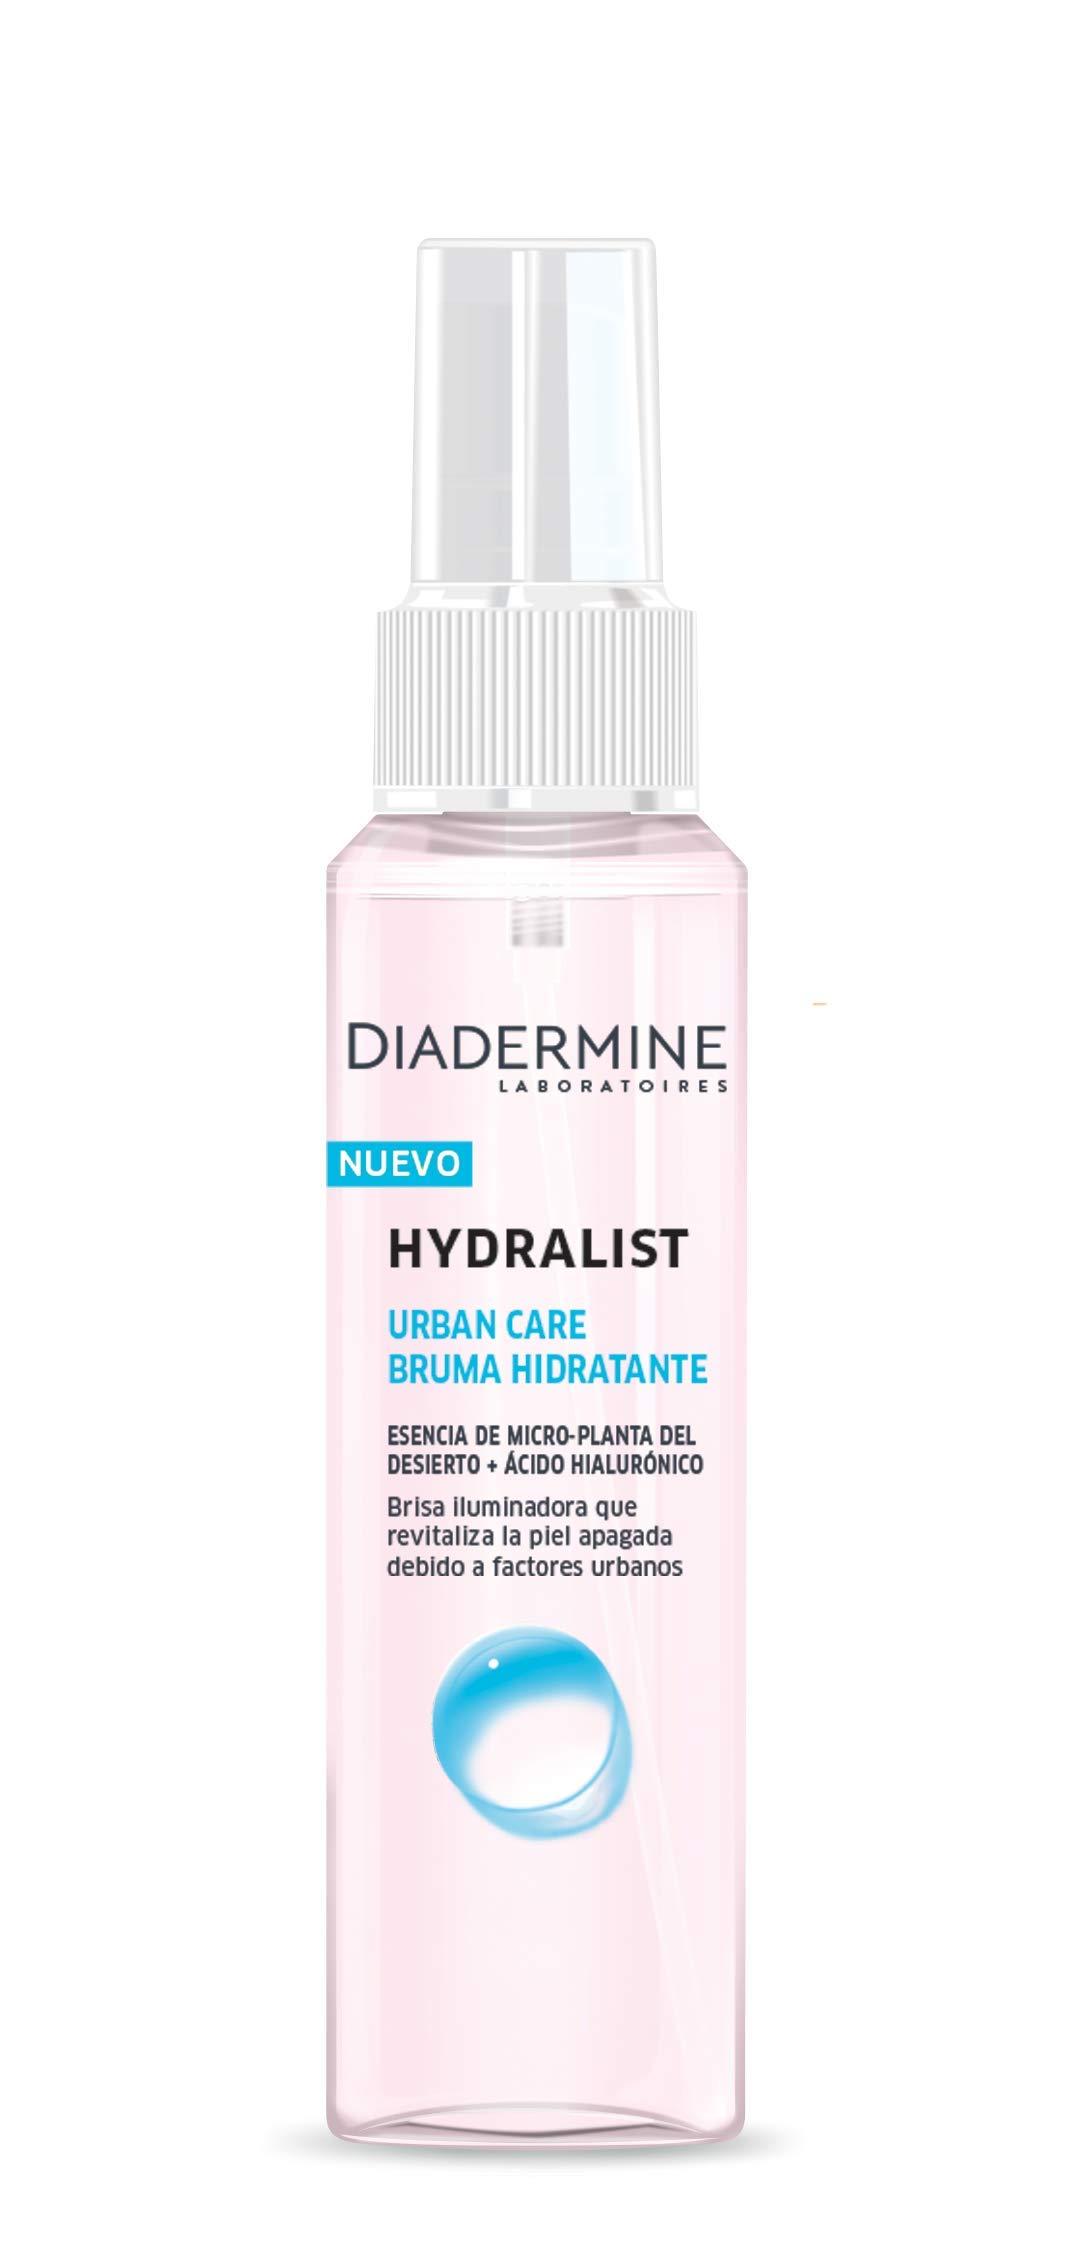 Diadermine – Pack Hydralist Urban Care, Crema de Día + Bruma Hidratante, 150 ml (50 ml + 100 ml)